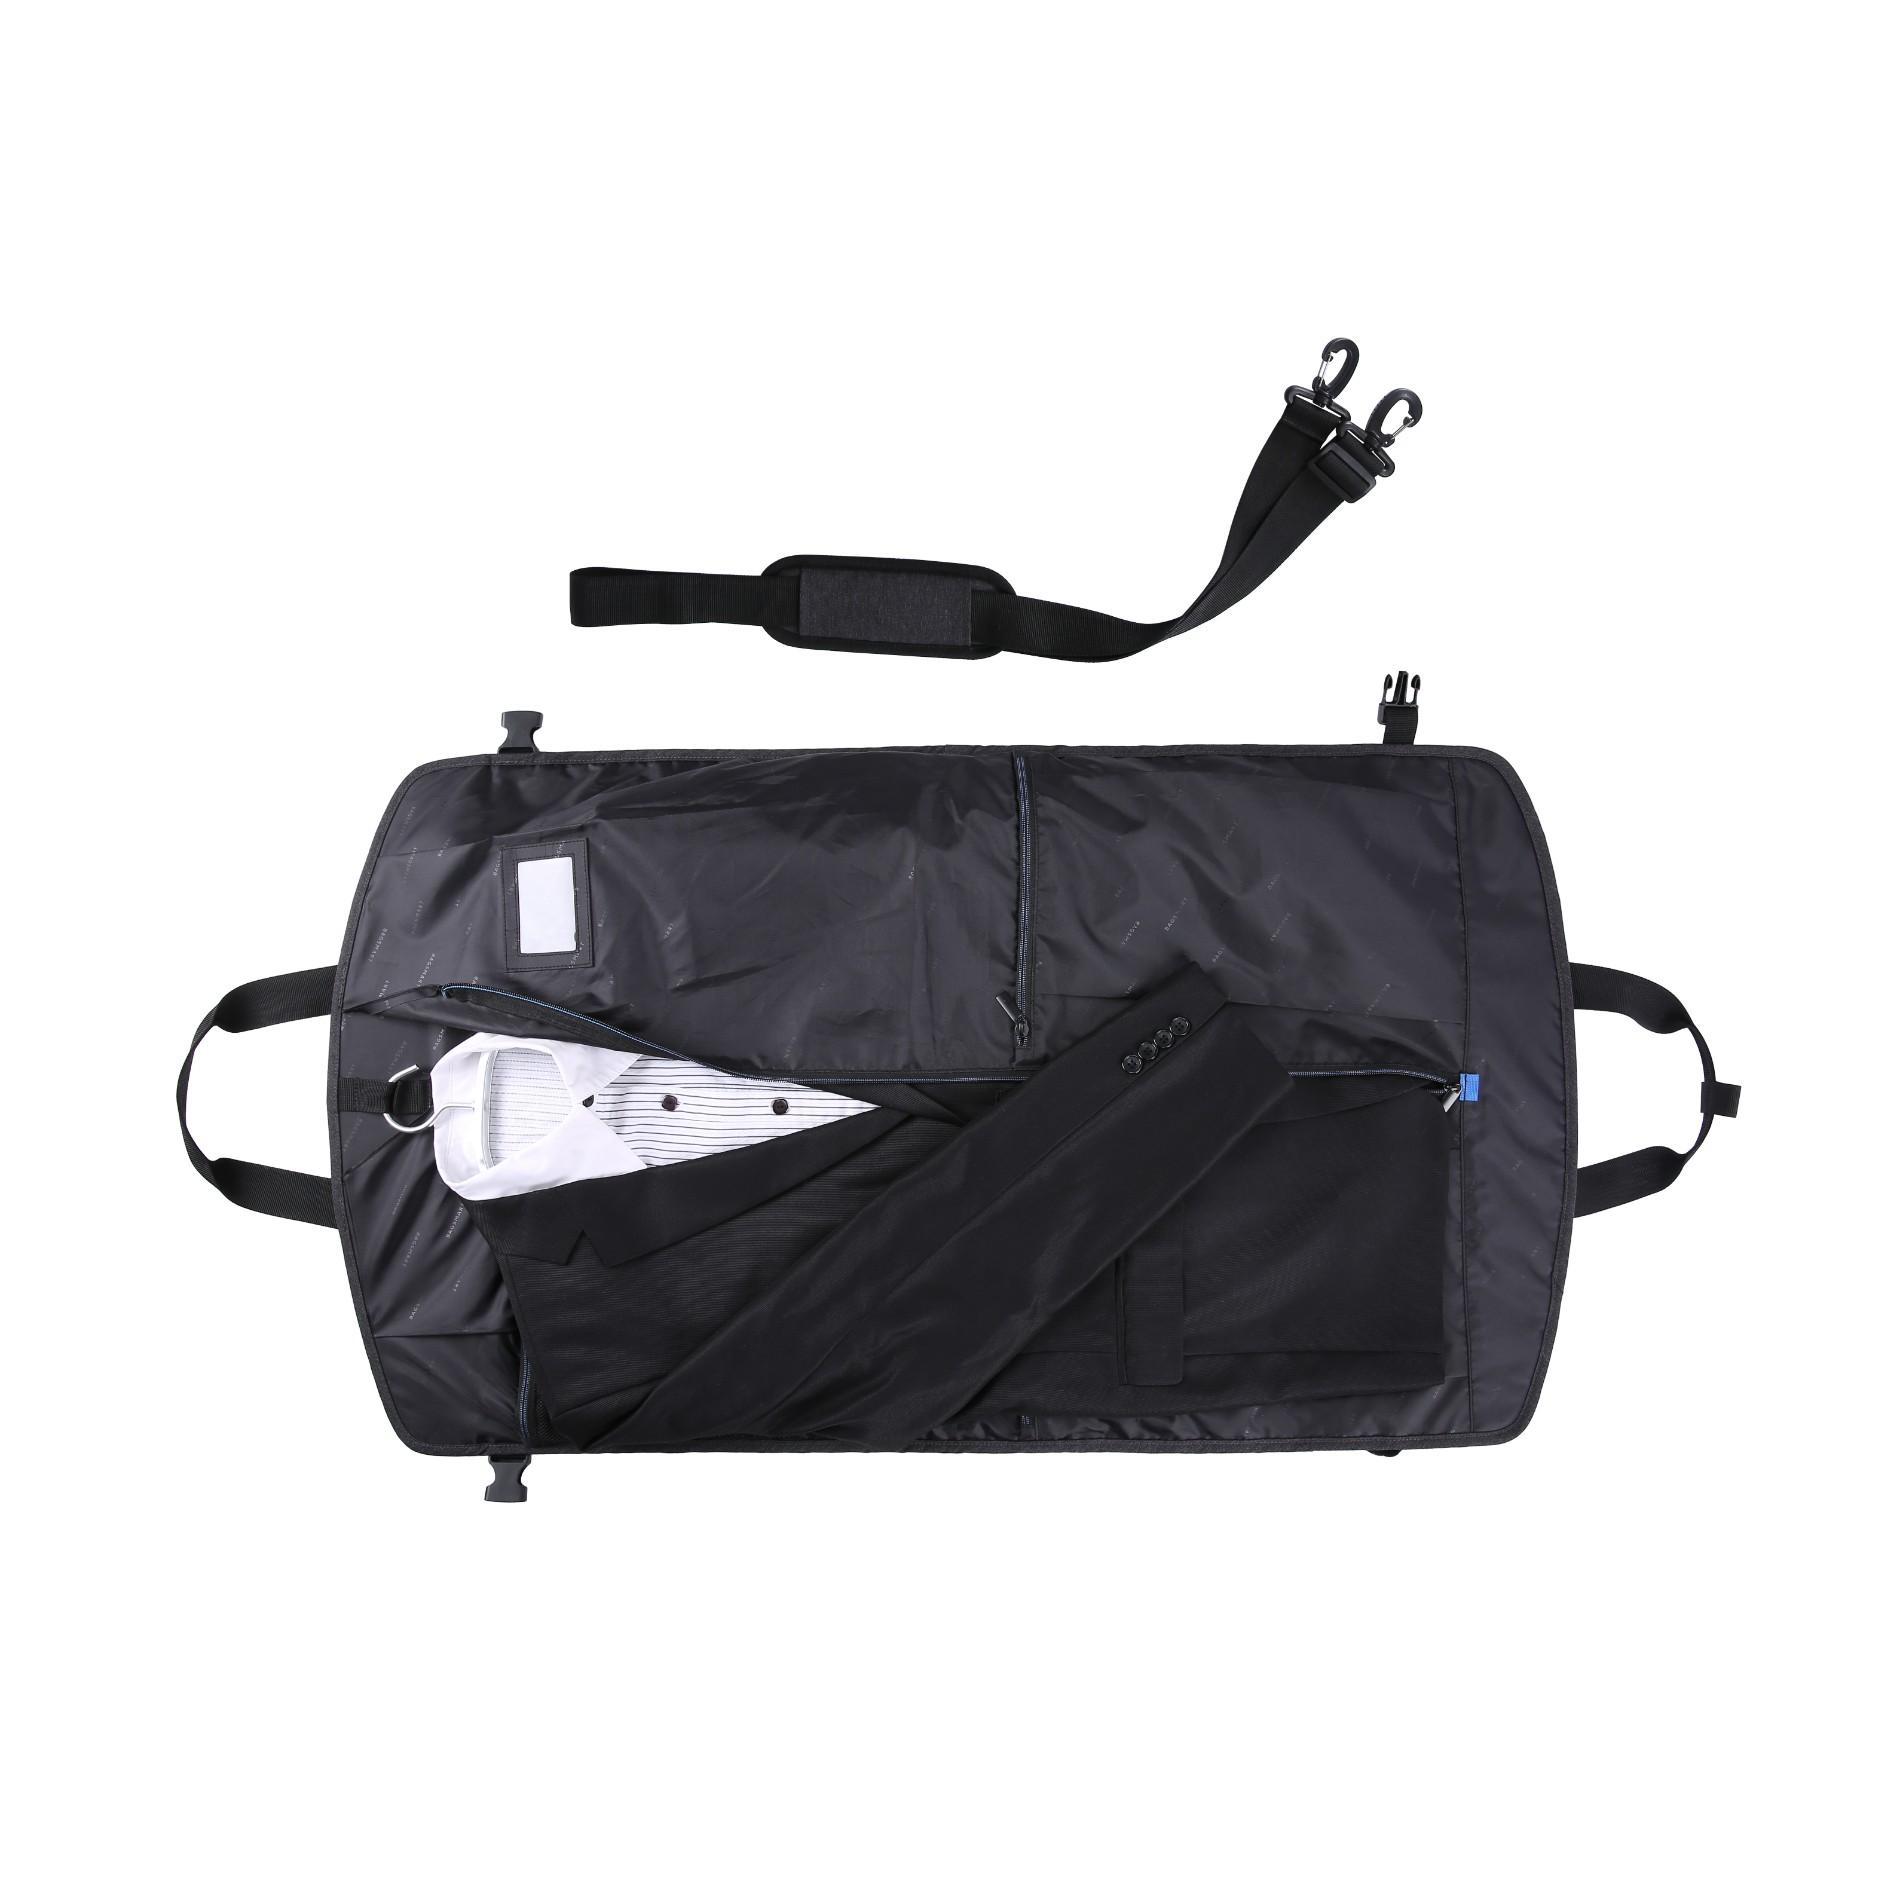 Garment Bag Manufacturers, Garment Bag Factory, Supply Garment Bag